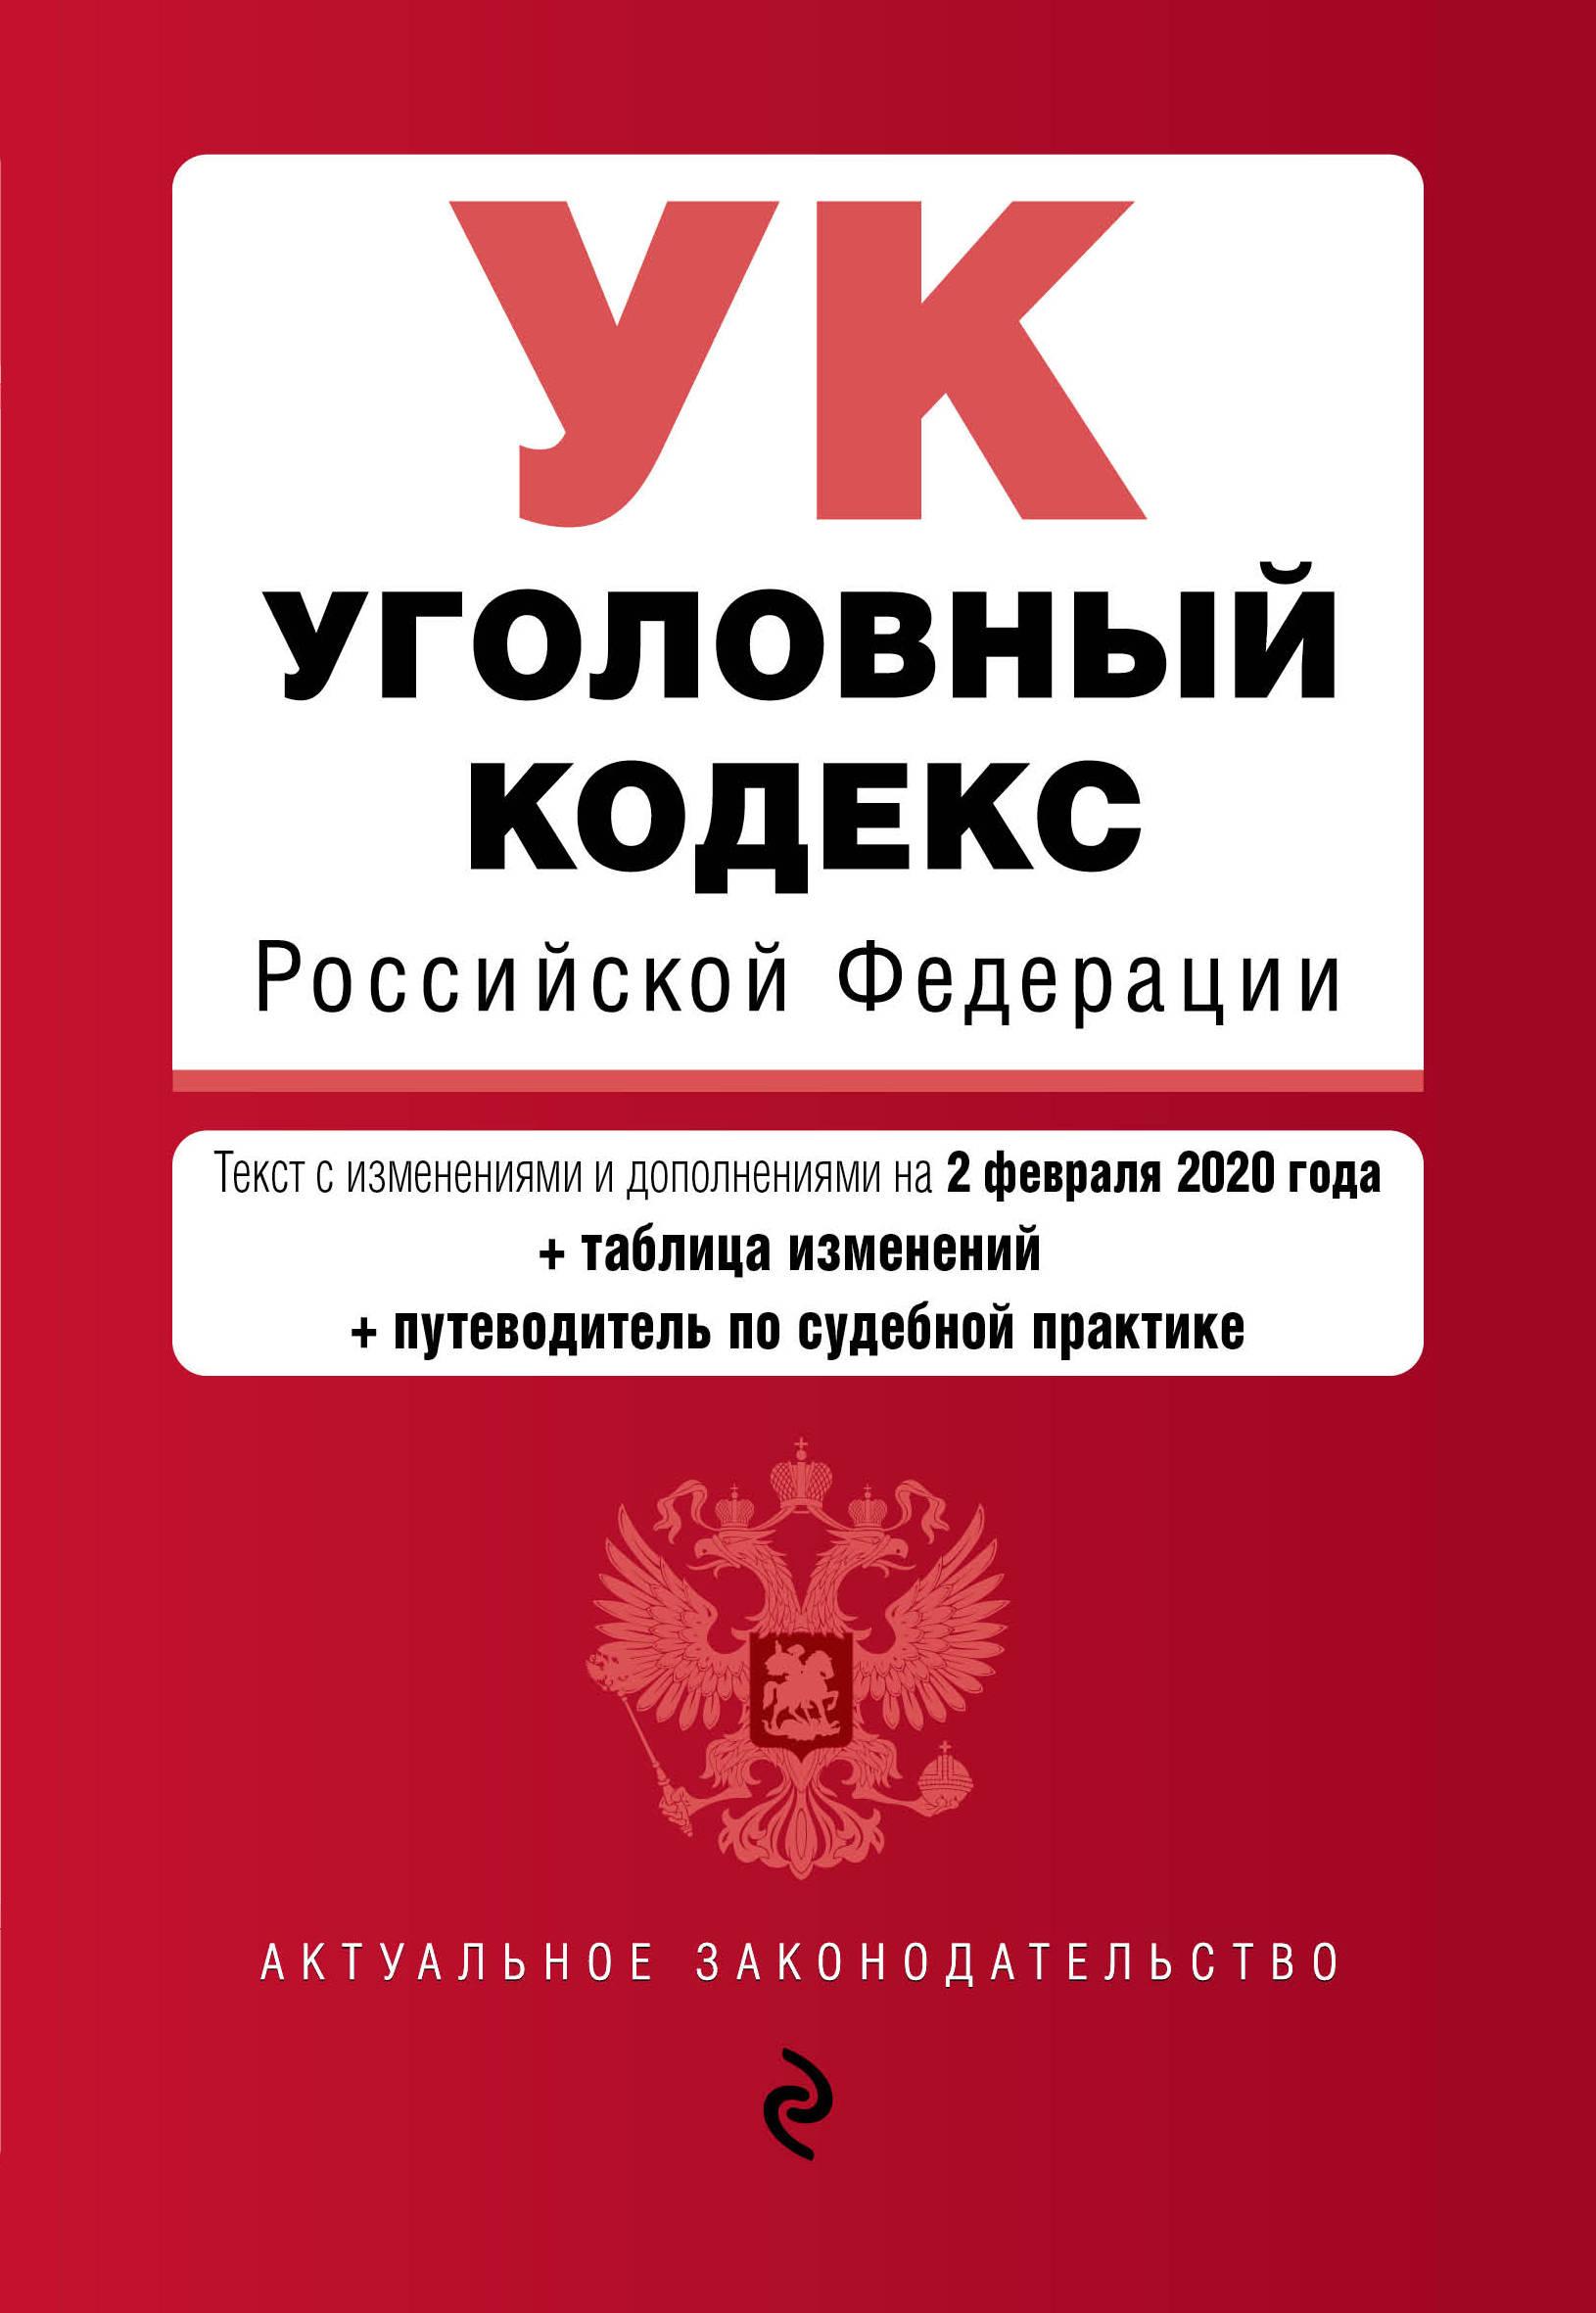 Ugolovnyj kodeks Rossijskoj Federatsii. Tekst s izm. i dop. na 2 fevralja 2020 goda (+ tablitsa izmenenij) (+ putevoditel po sudebnoj praktike)